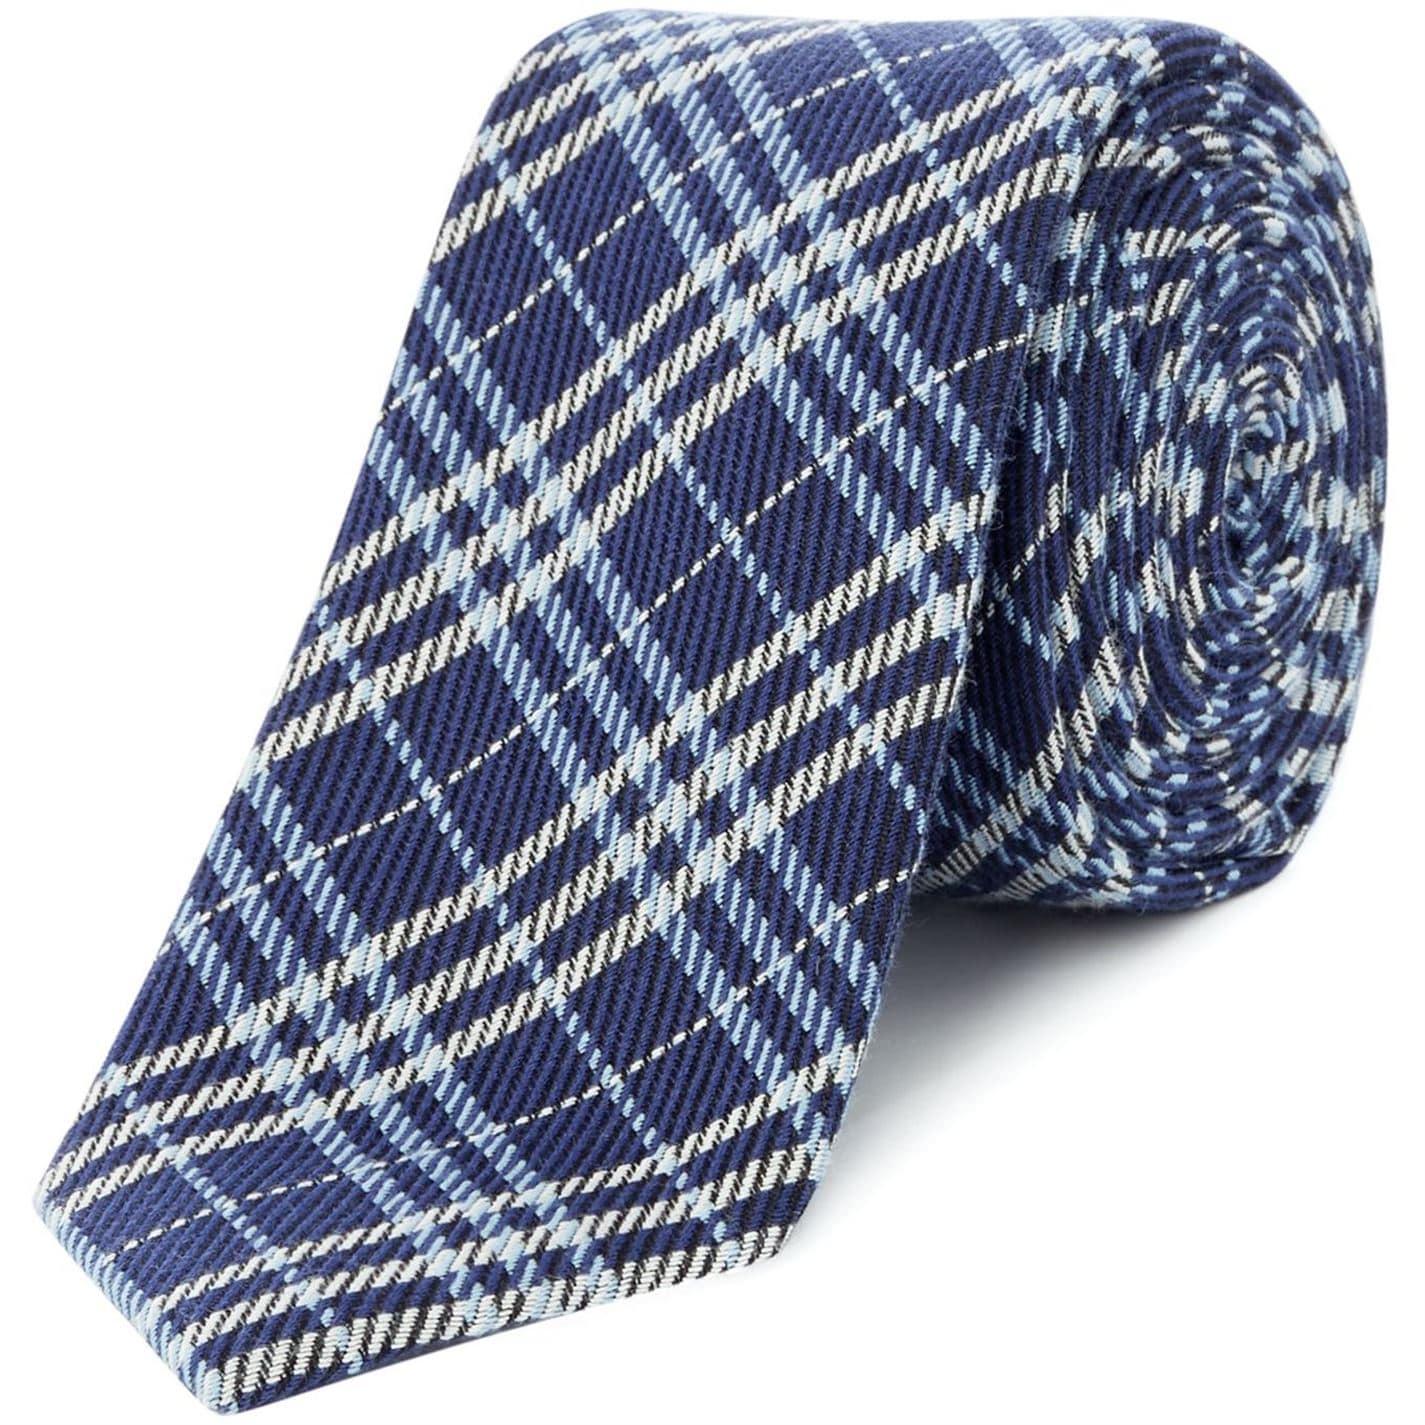 Turner and Sanderson Halden Woven Check Tie